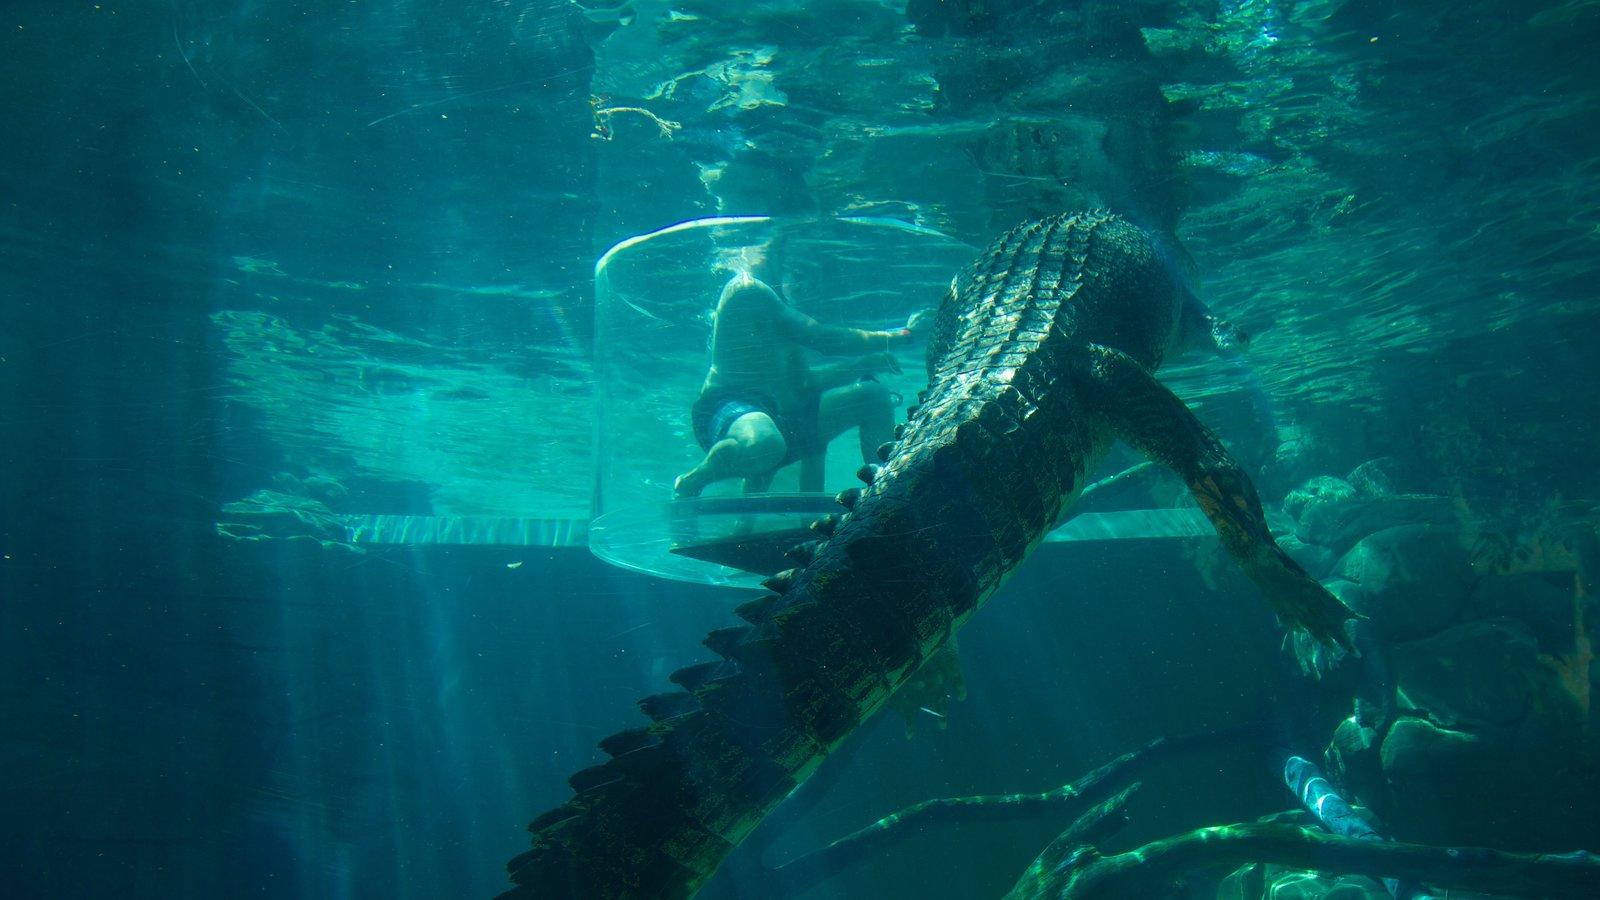 Crocosaurus Cove which includes dangerous animals